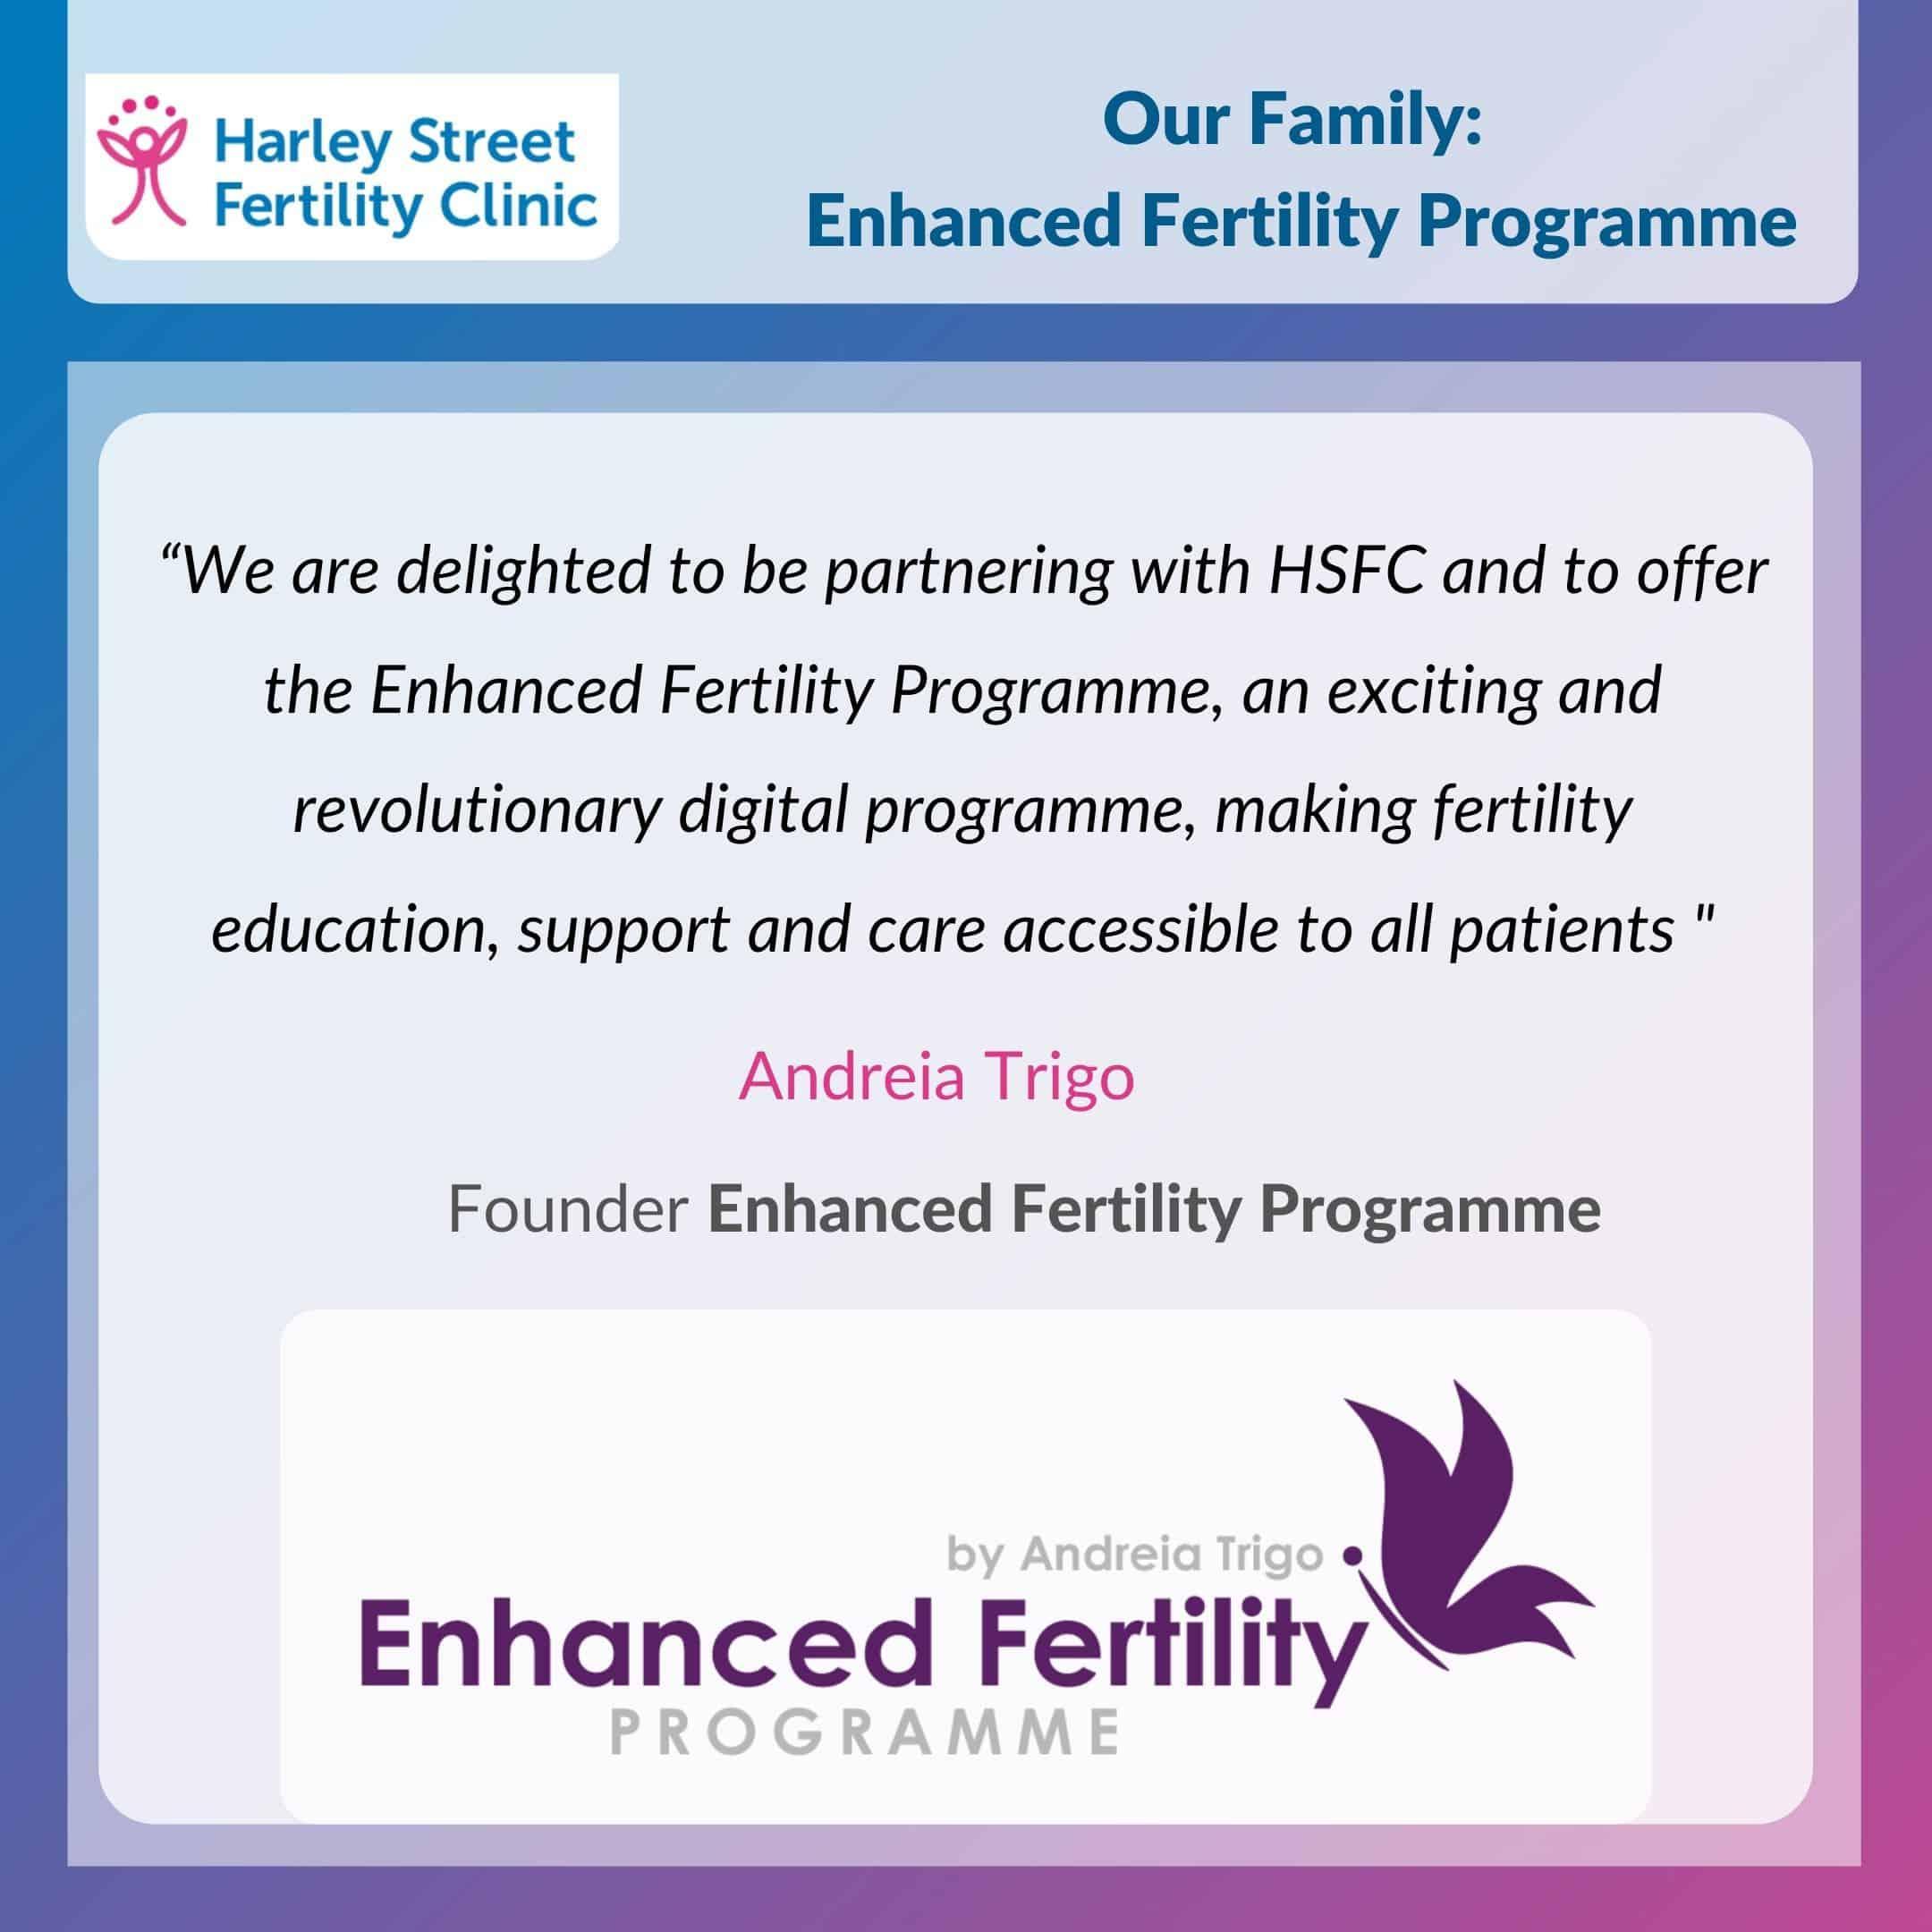 Our family: The Enhanced Fertility Programme